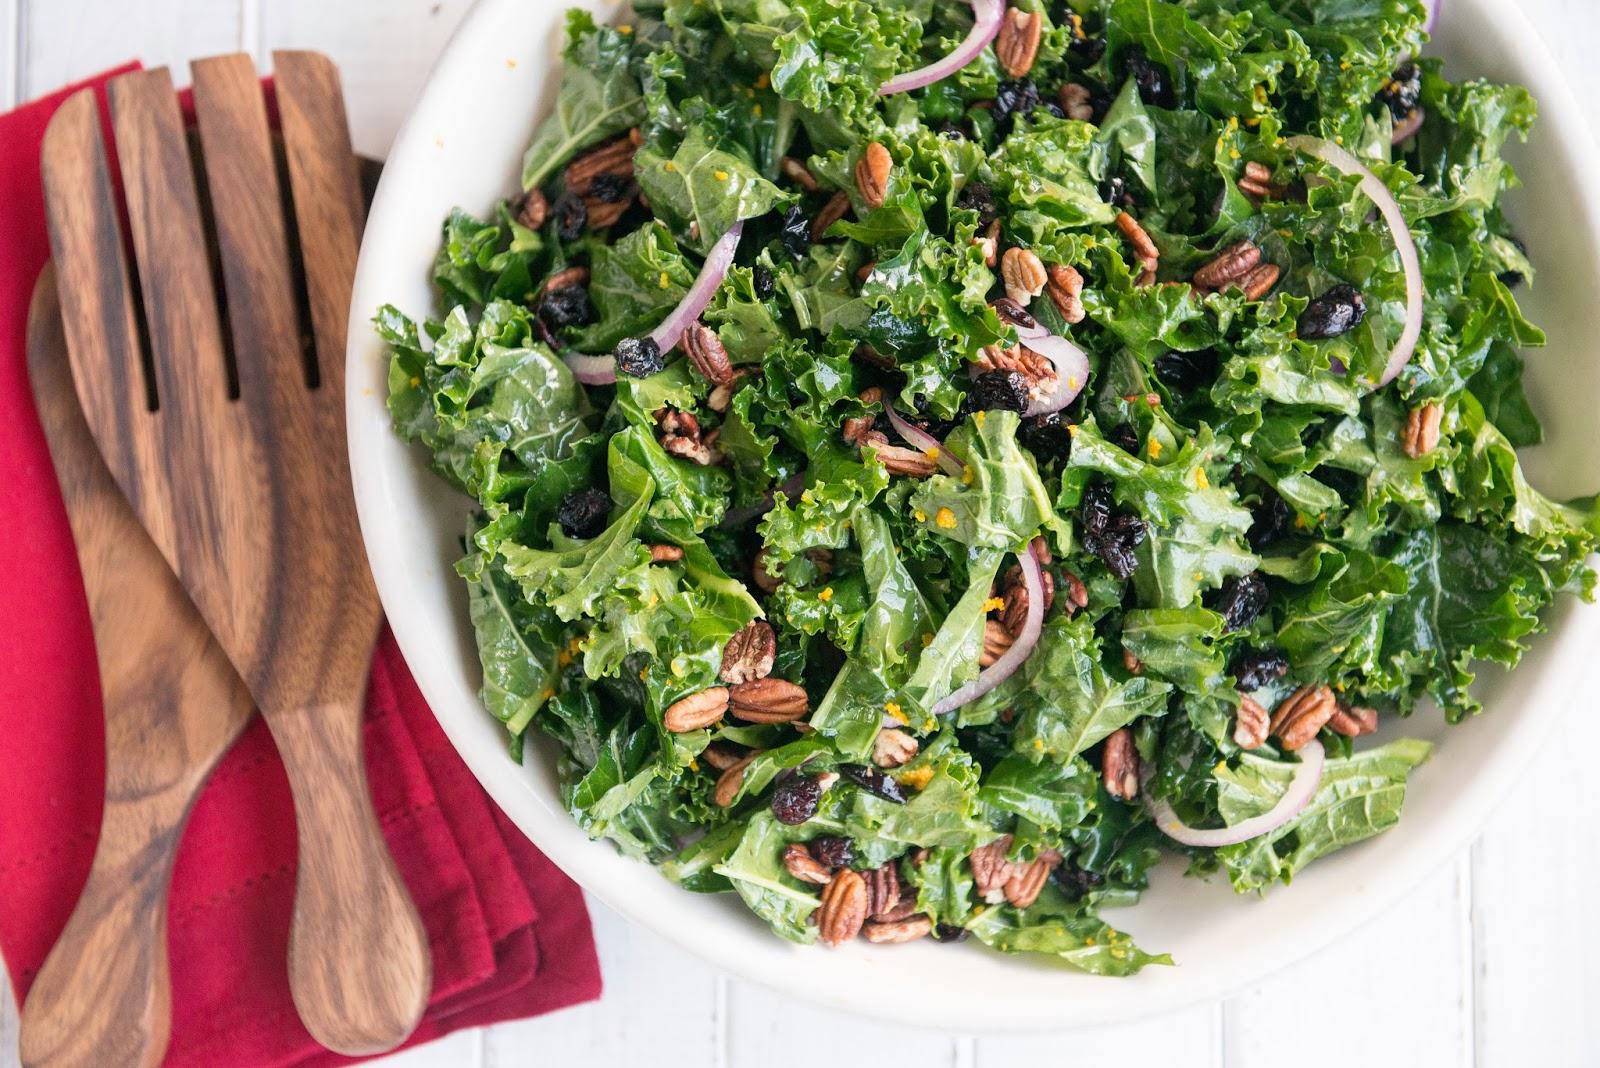 Nourishing Meals: Christmas Kale Salad